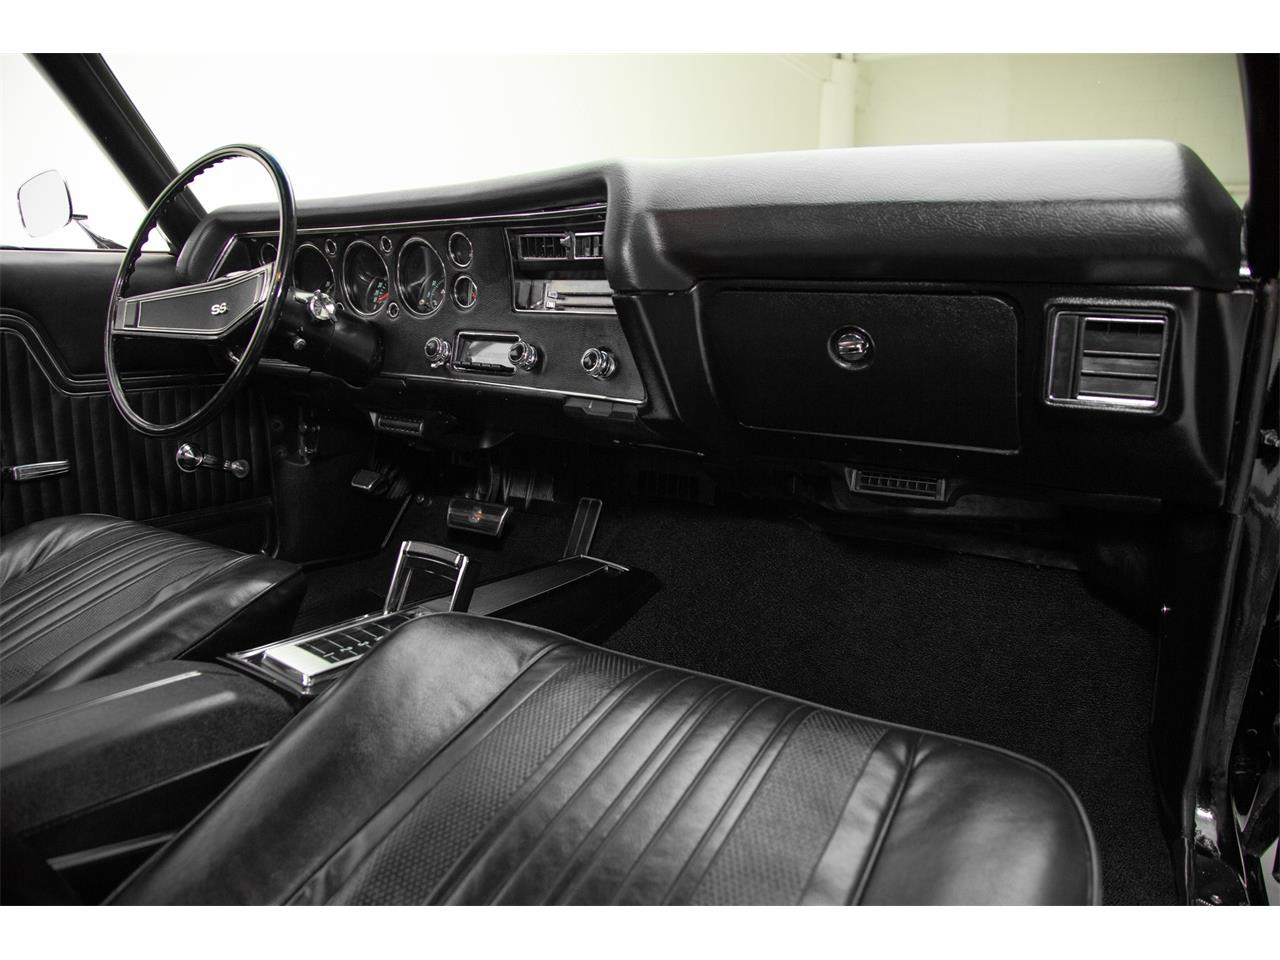 1970 Chevrolet Chevelle (CC-1248832) for sale in Des Moines, Iowa